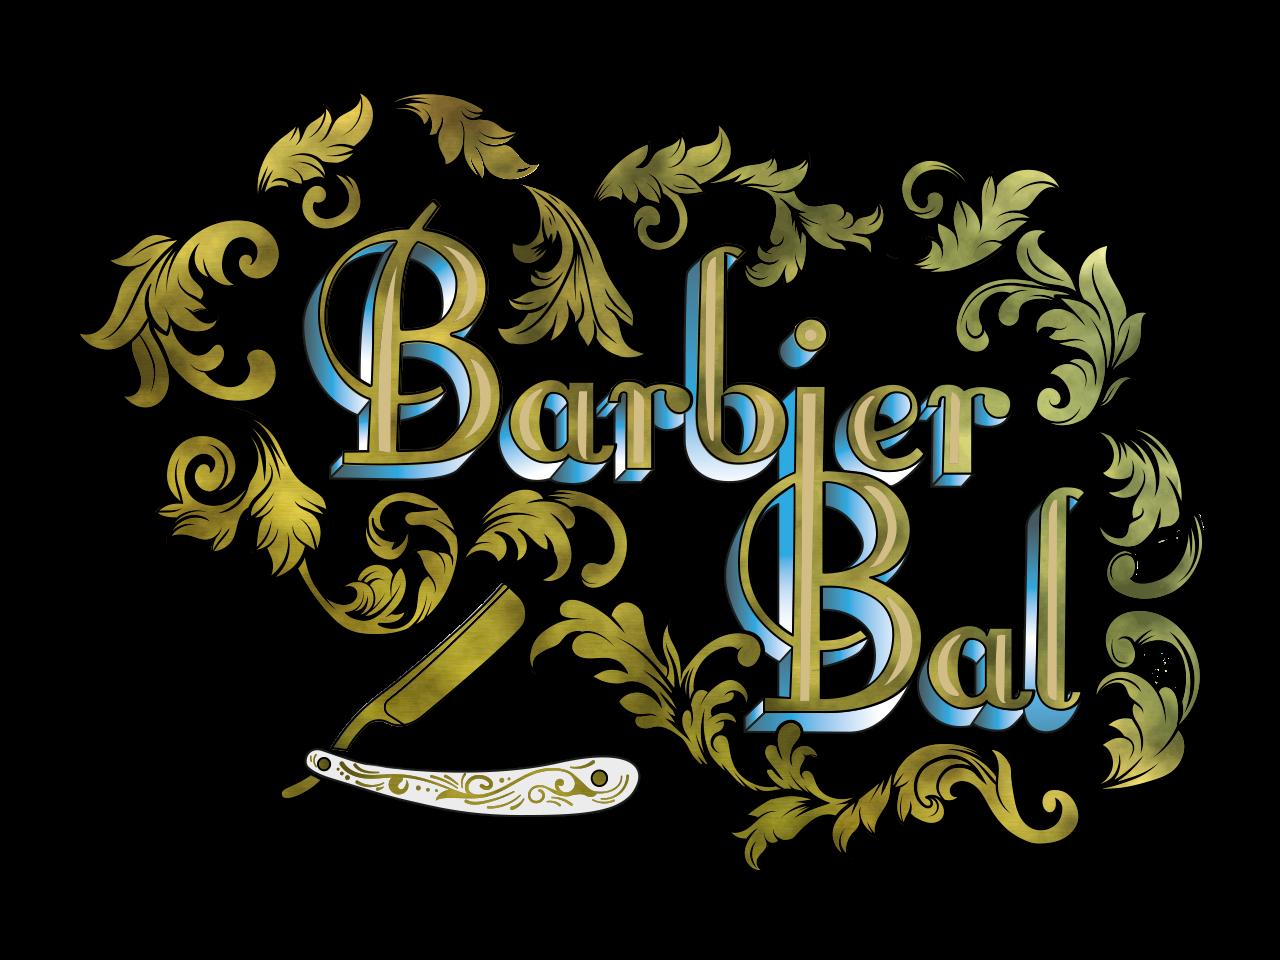 Barbier Bal